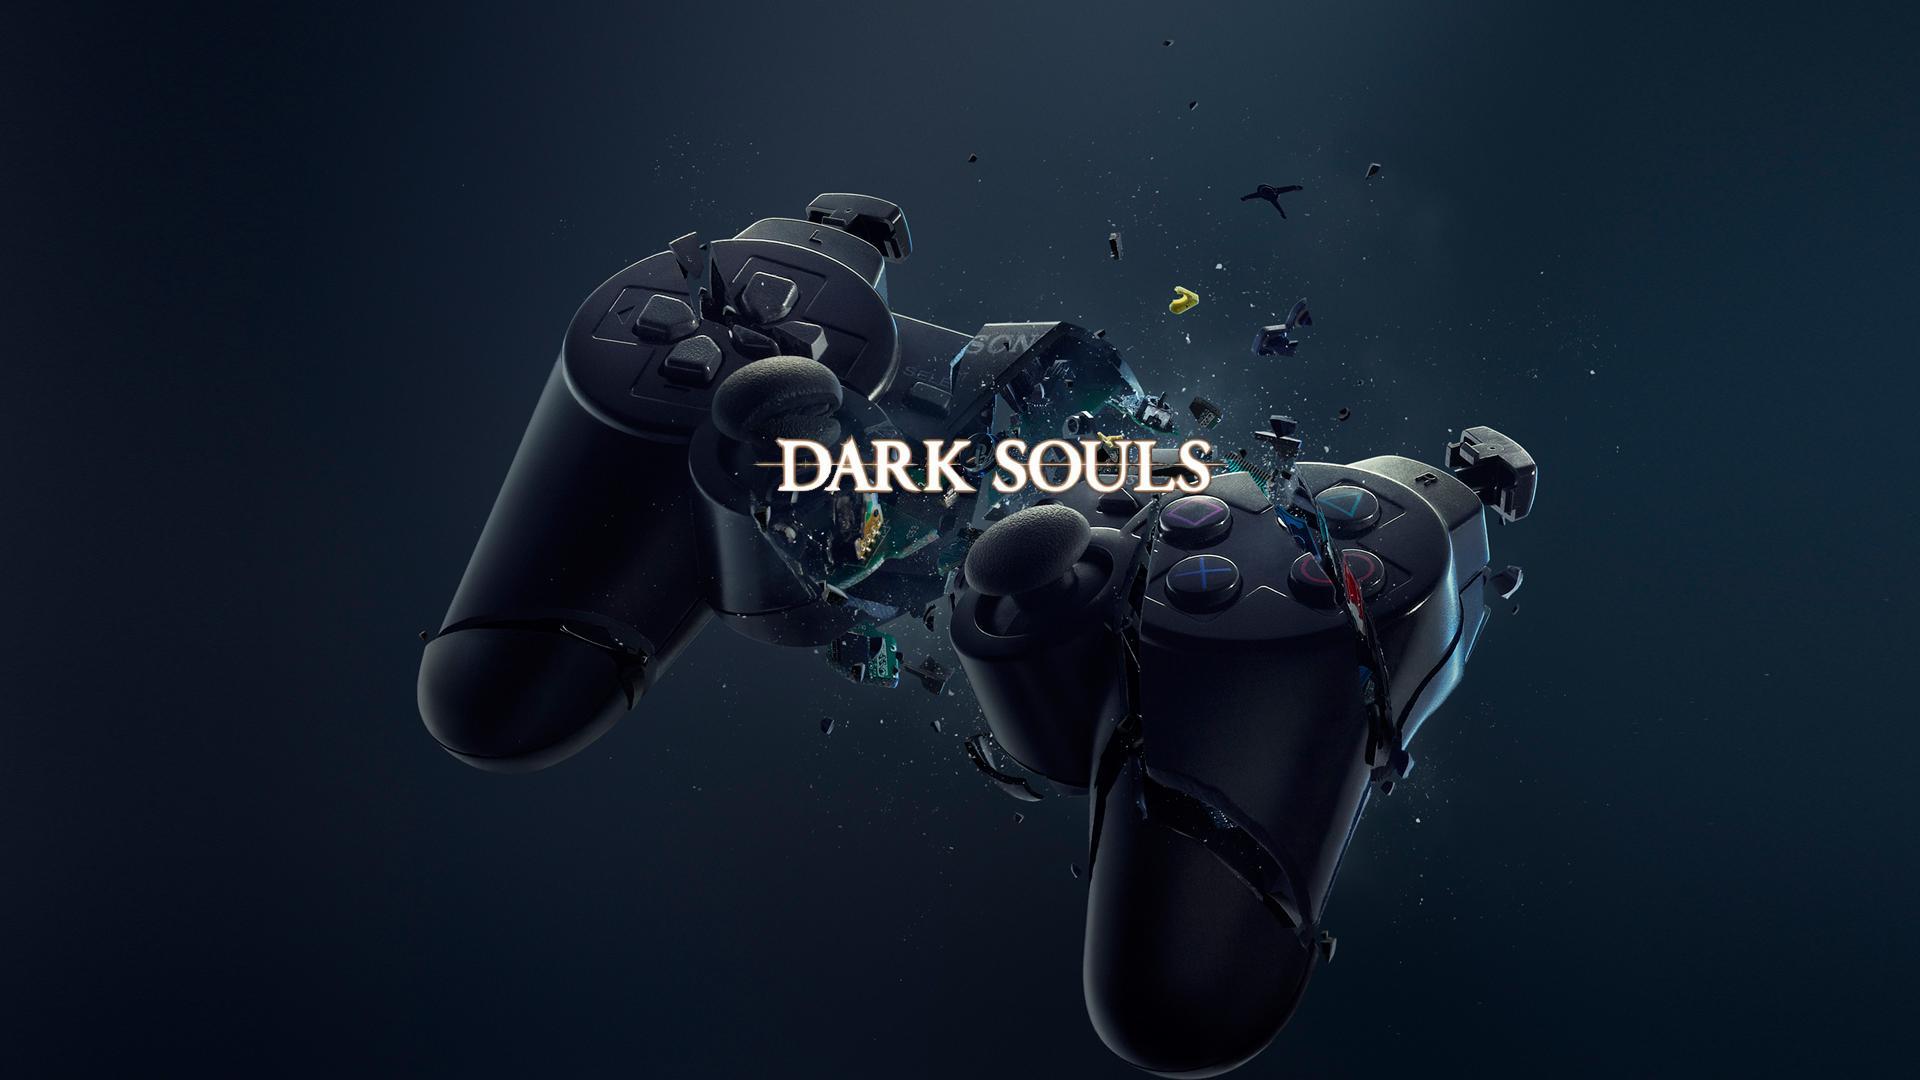 Dark Souls 3 Wallpaper 1080p: Dark Souls 3 HD Wallpaper